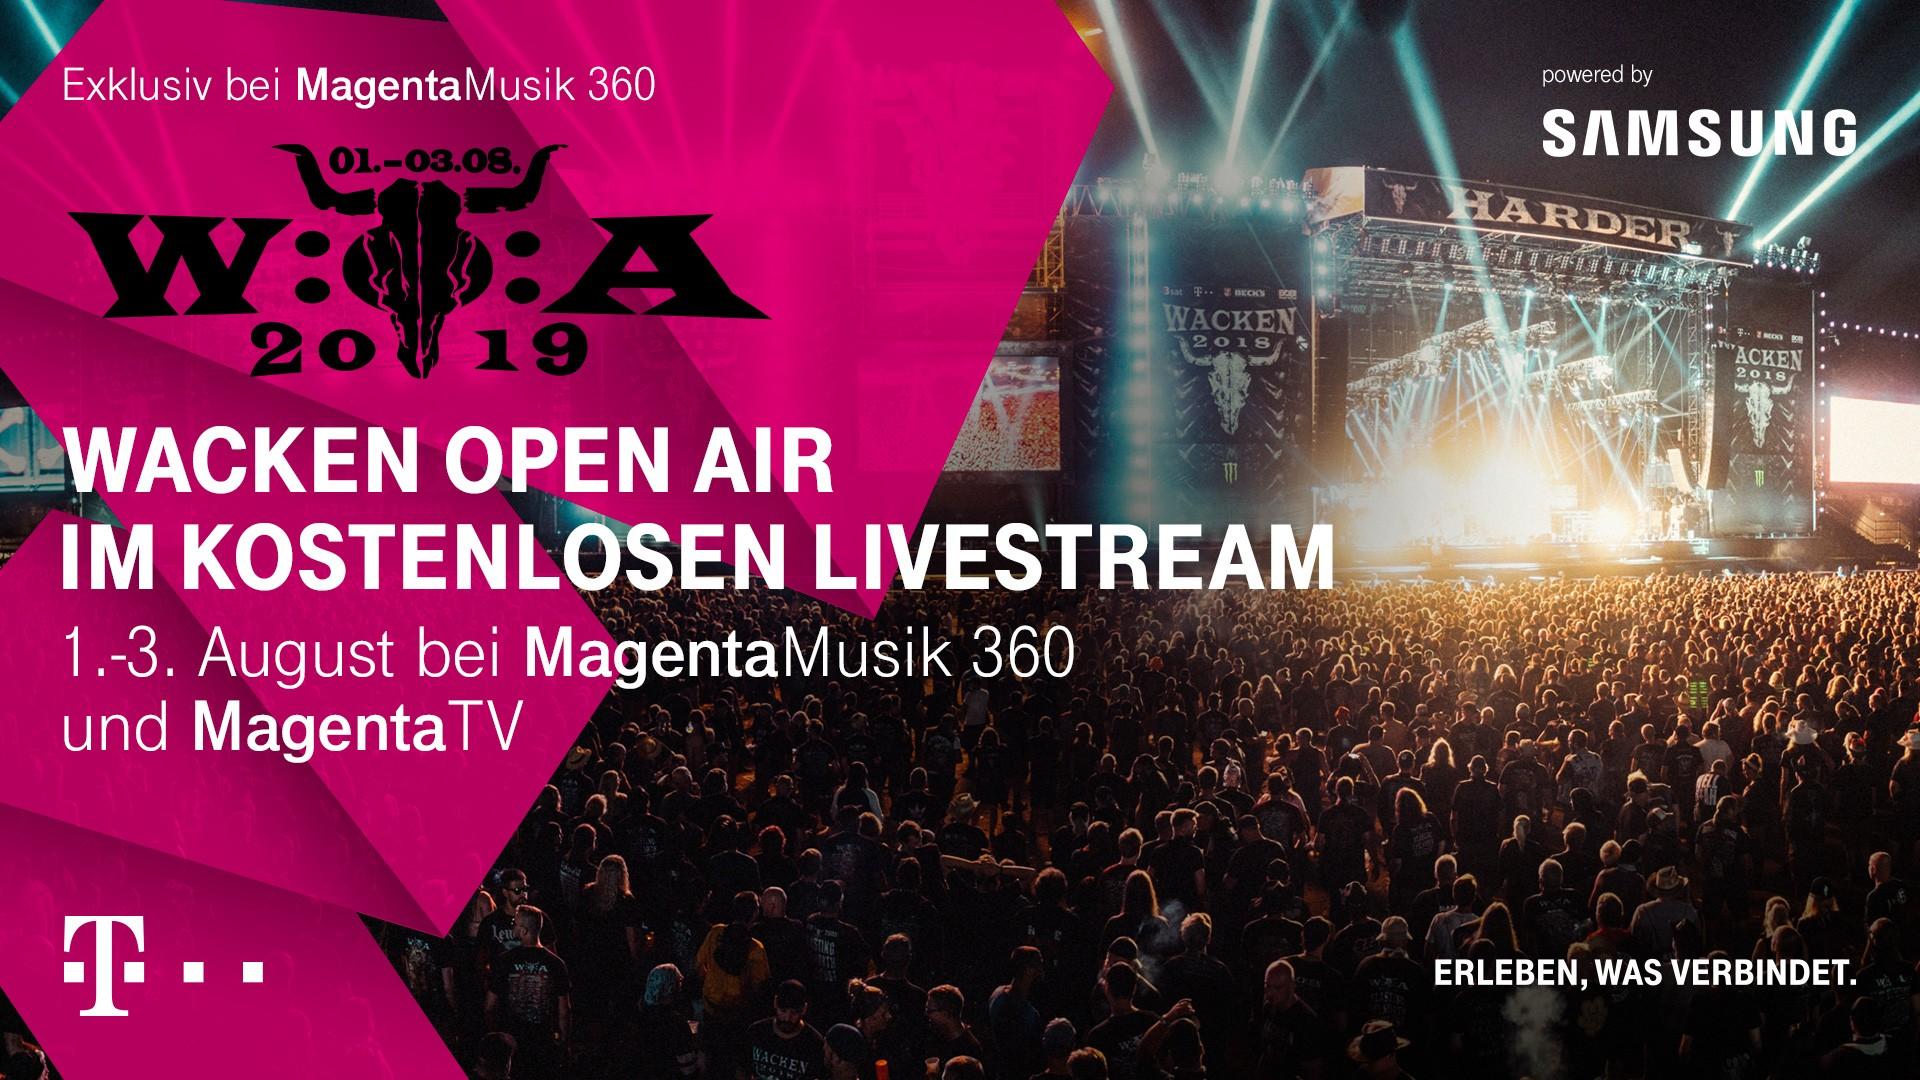 keyvisual 1920x1080 wacken 2019 v9a - Verlosung: Wacken Open Air